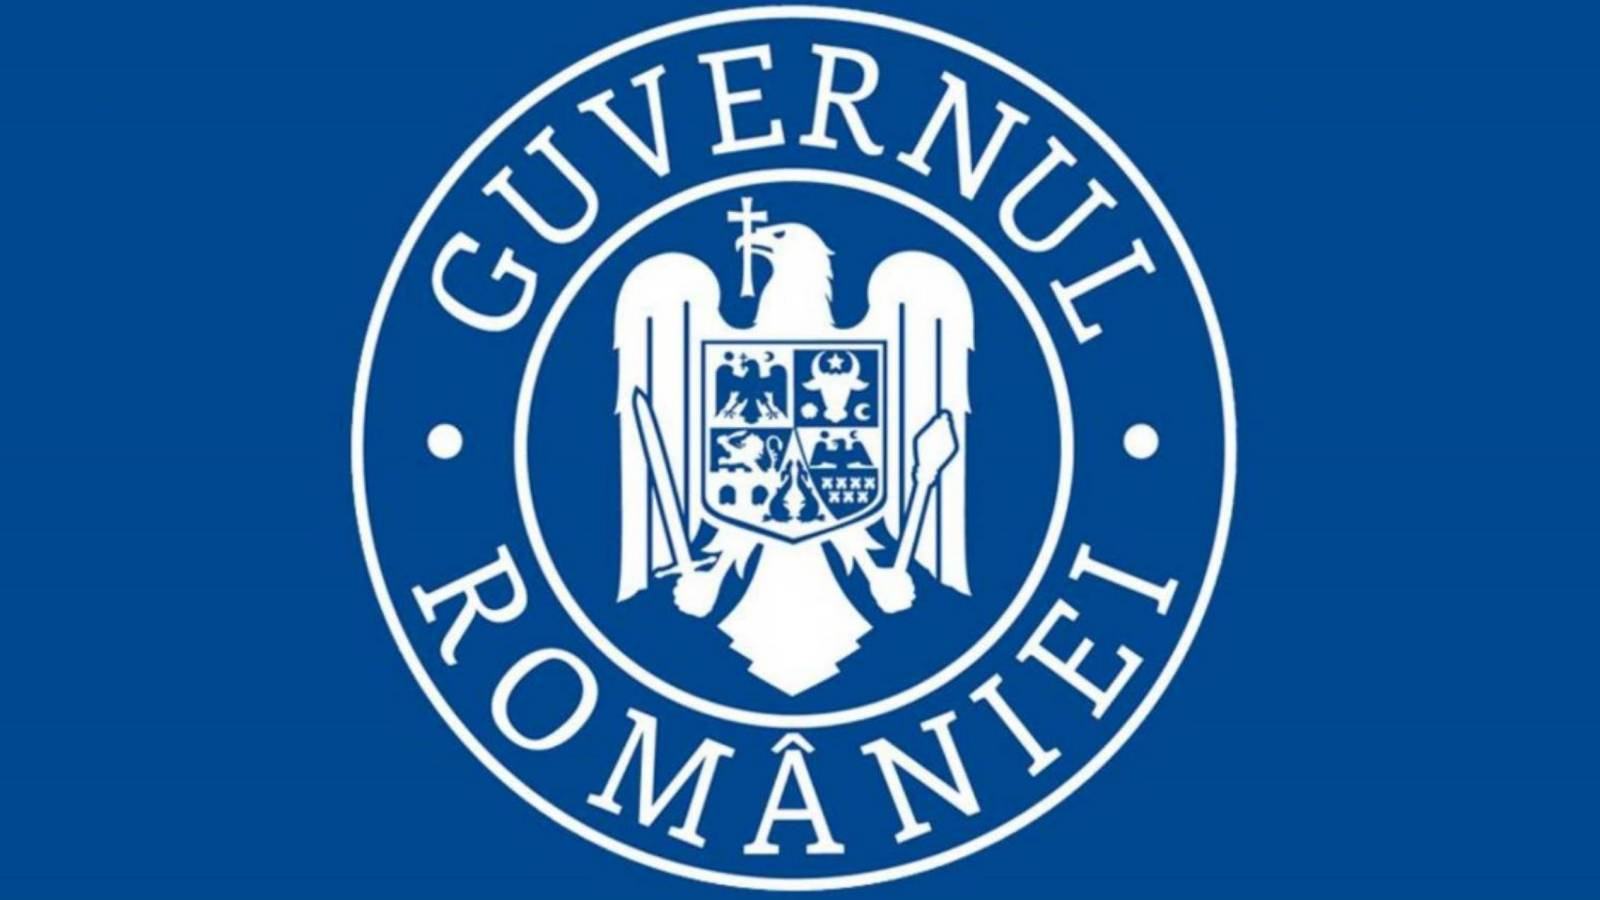 guvernul romaniei avertisment furturile date